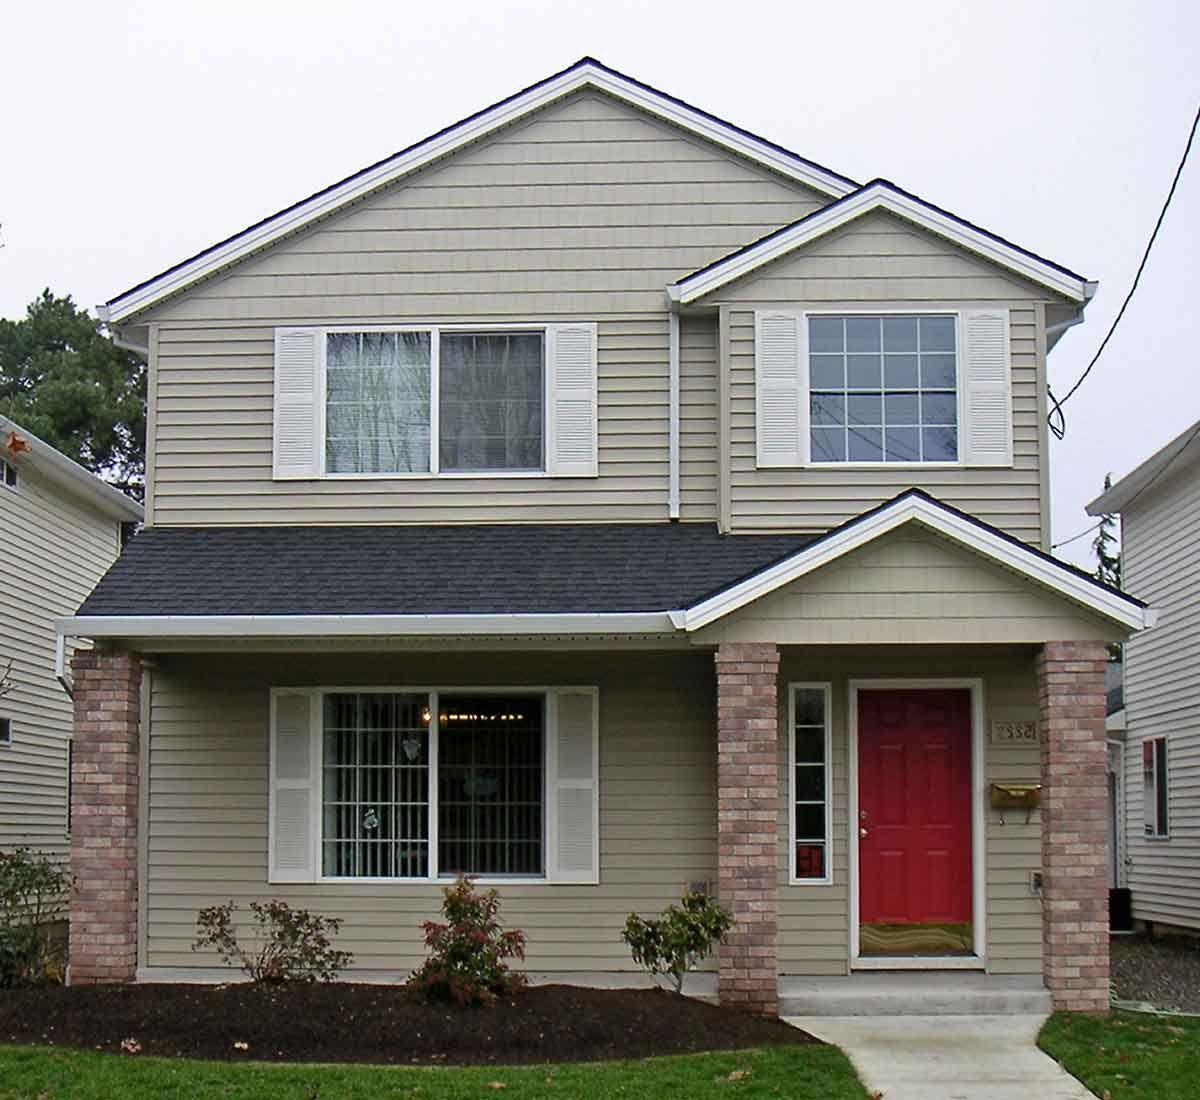 Best Inspiring Small House Plans | Narrow lot house plans ...